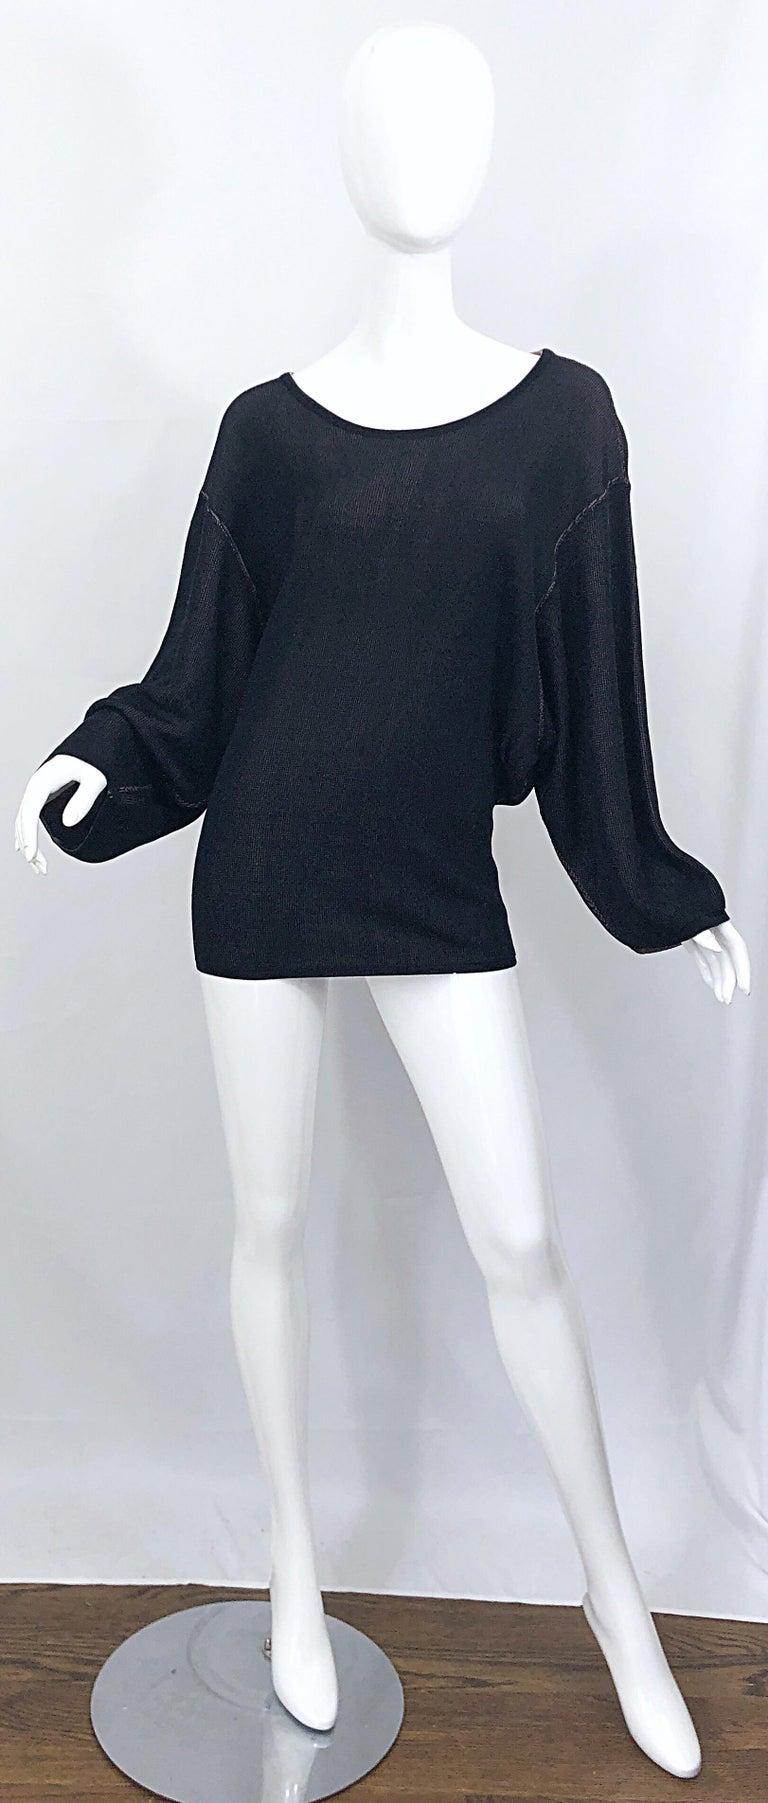 Vintage Azzedine Alaia 1980s  Black + Nude Viscose 80s Mini Sweater Dress Tunic For Sale 10